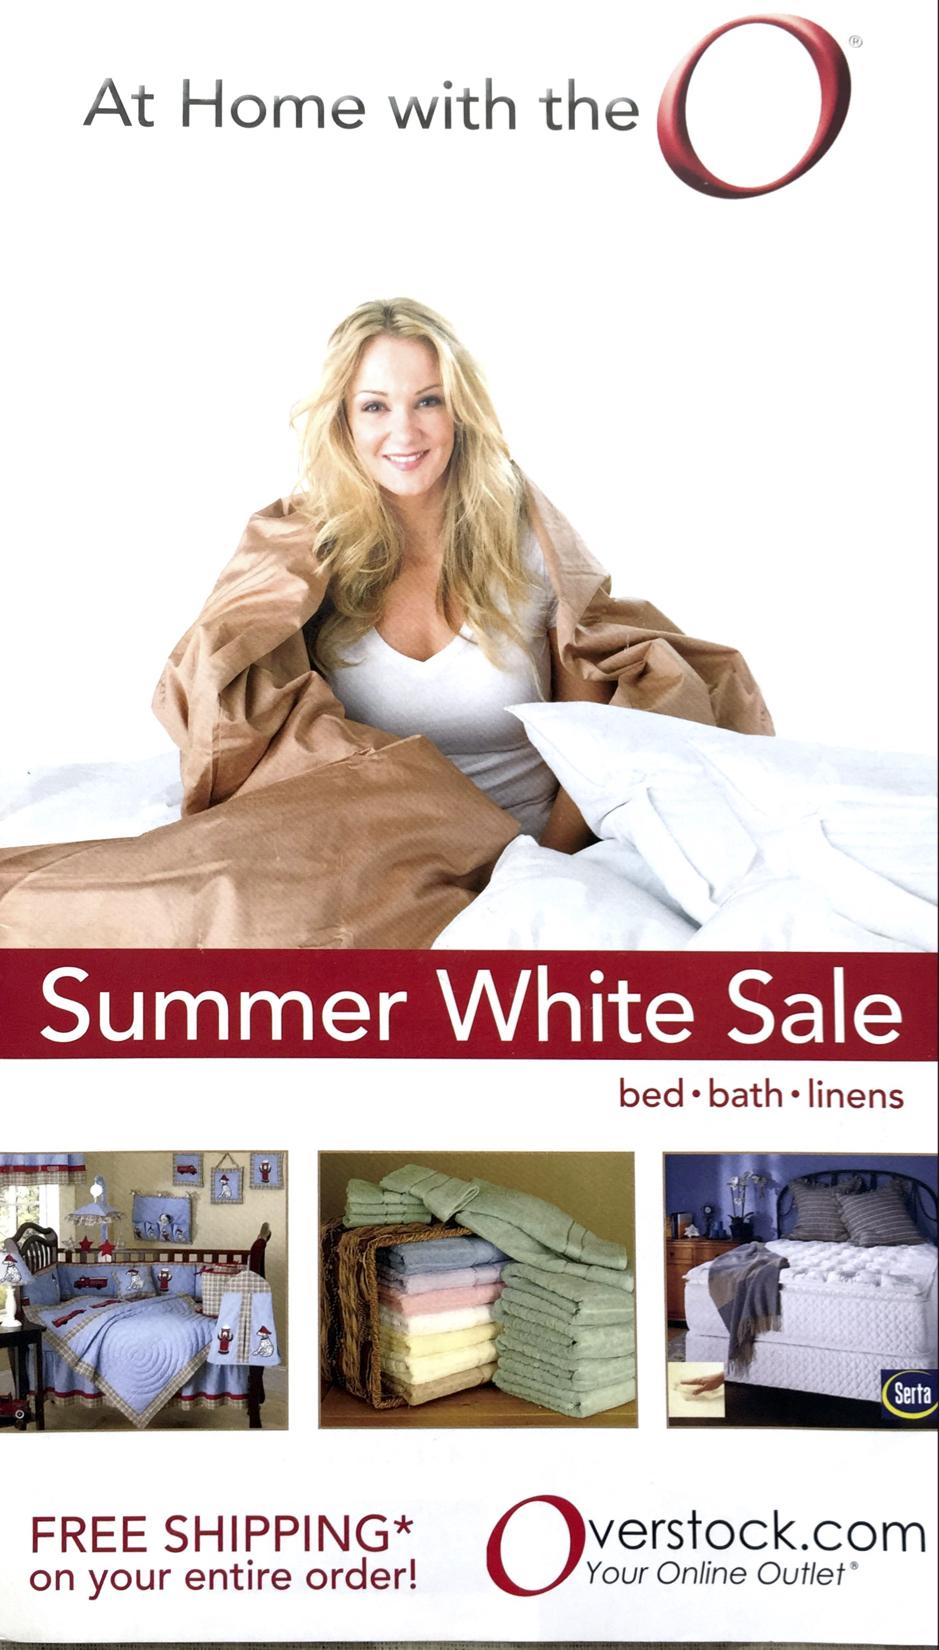 Summer White Sale copy.jpg